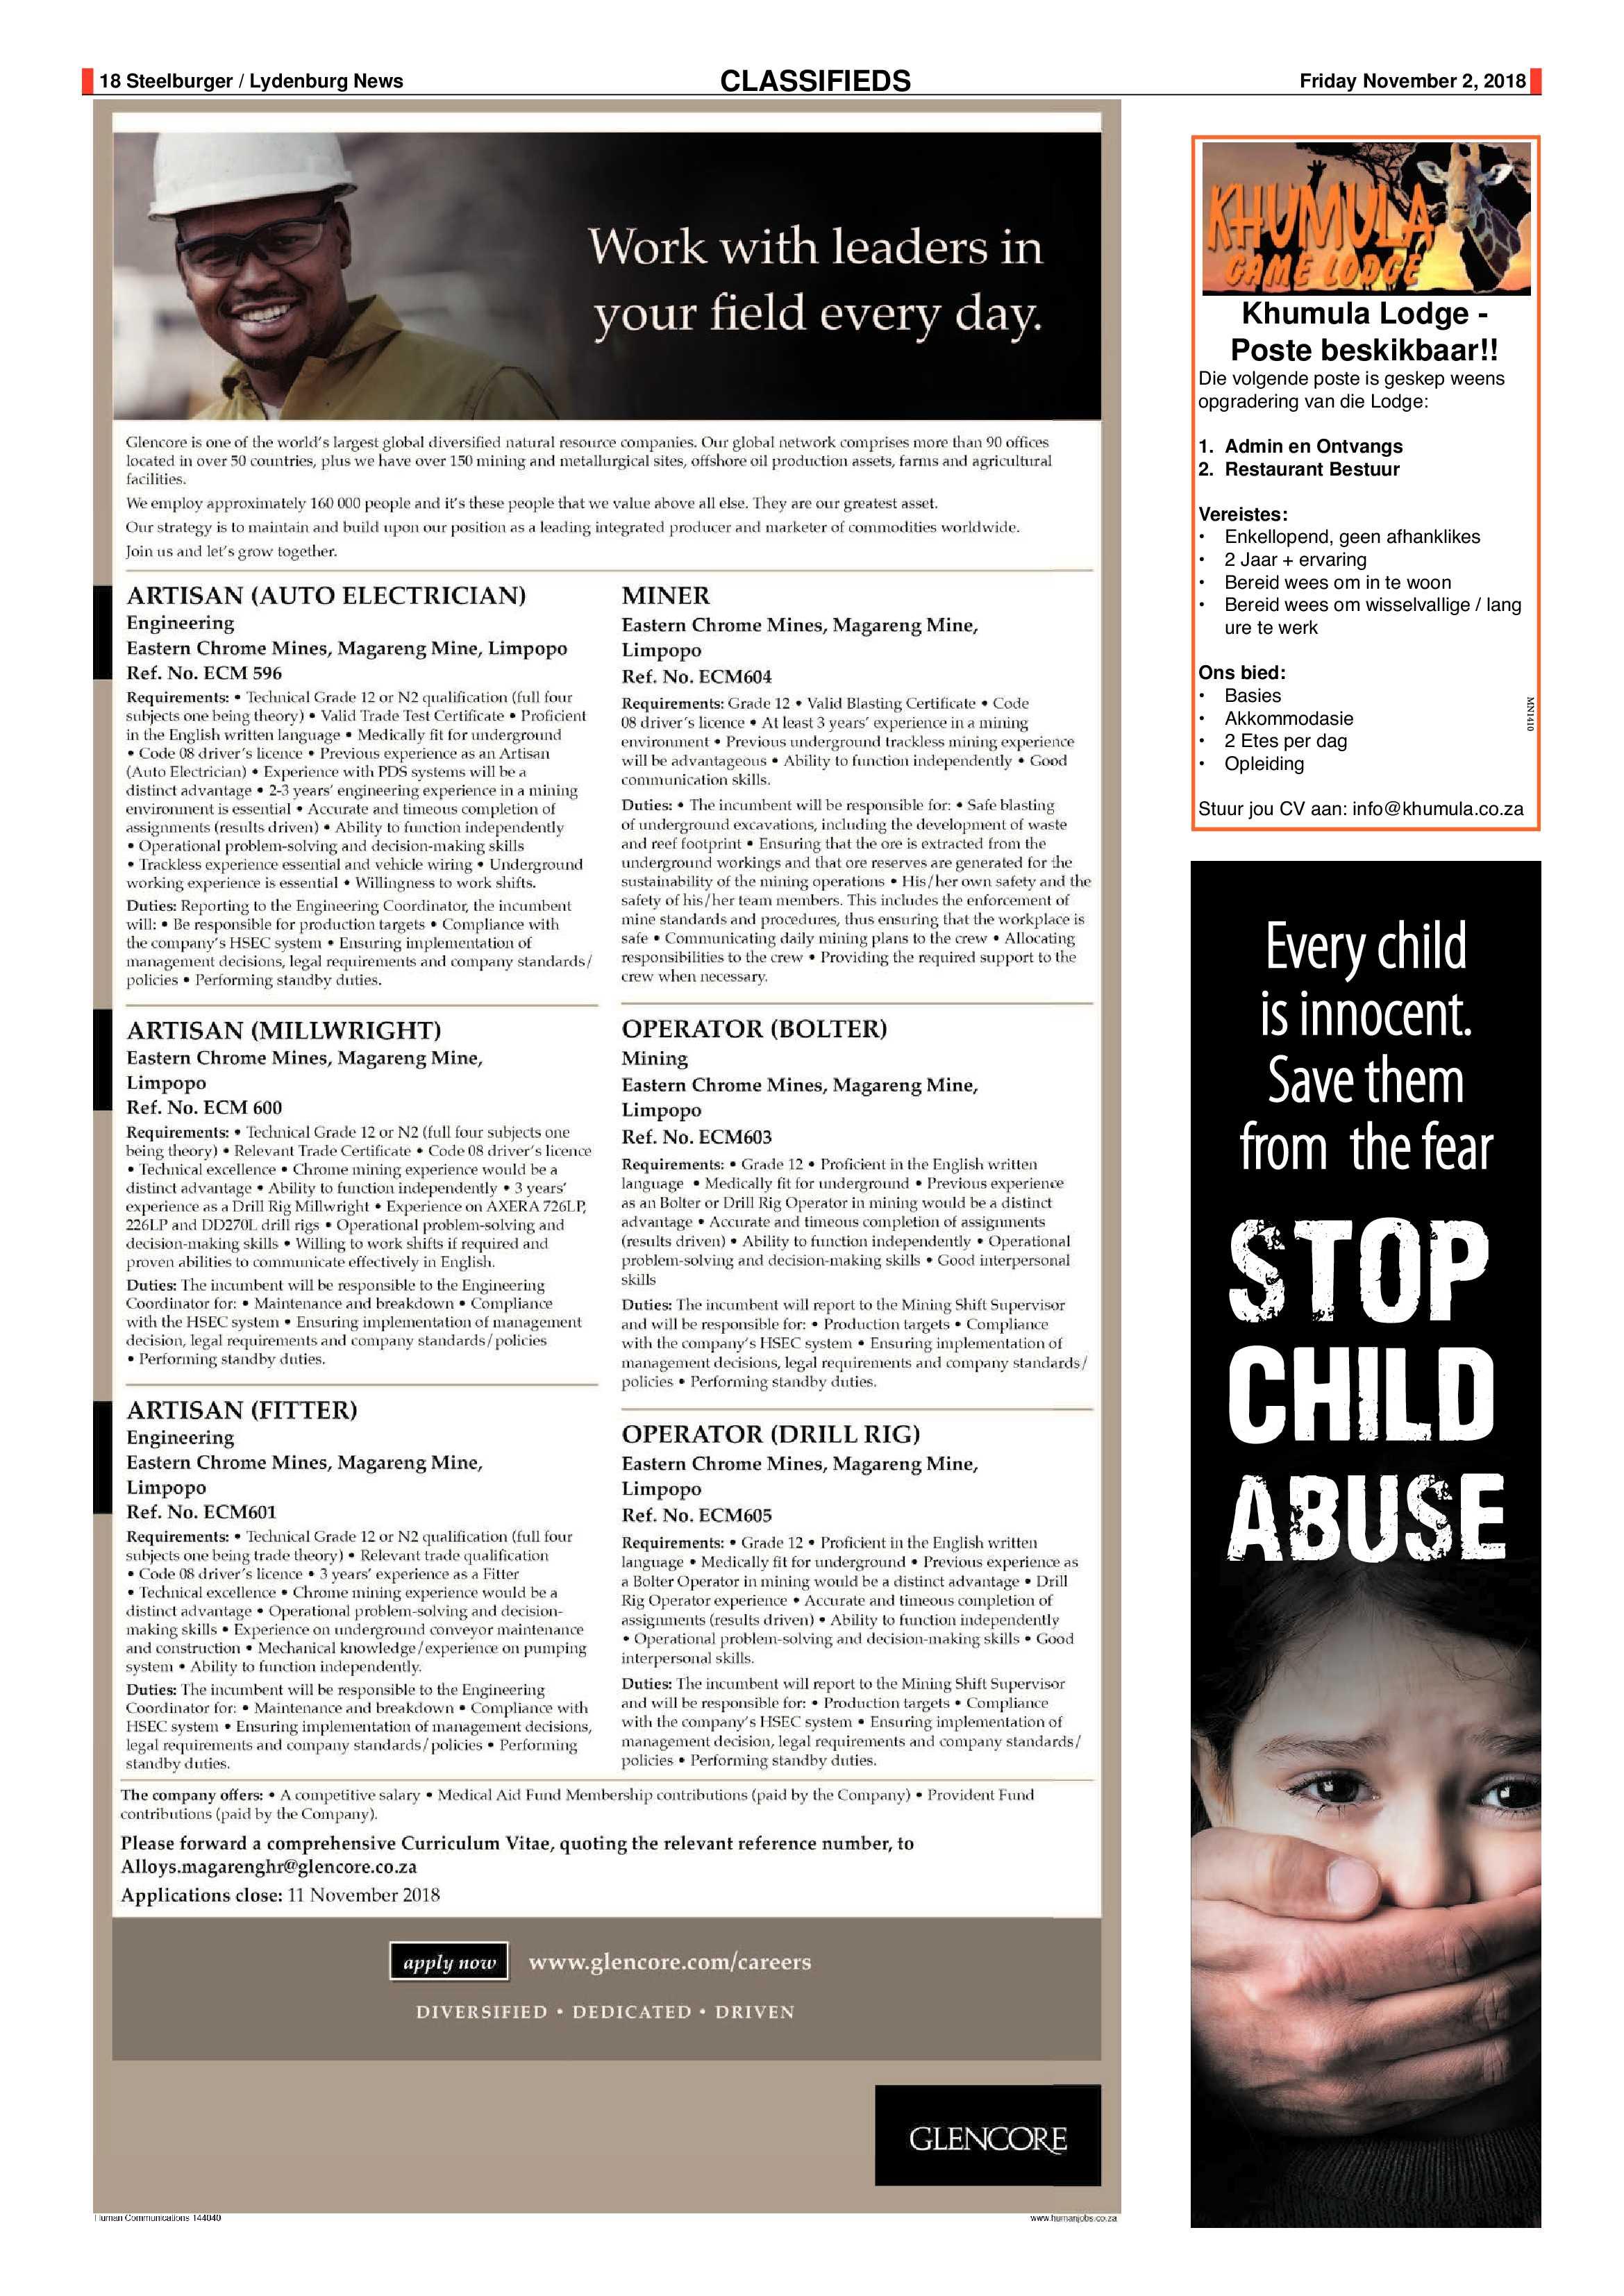 steelburger-news-2-november-2018-epapers-page-18